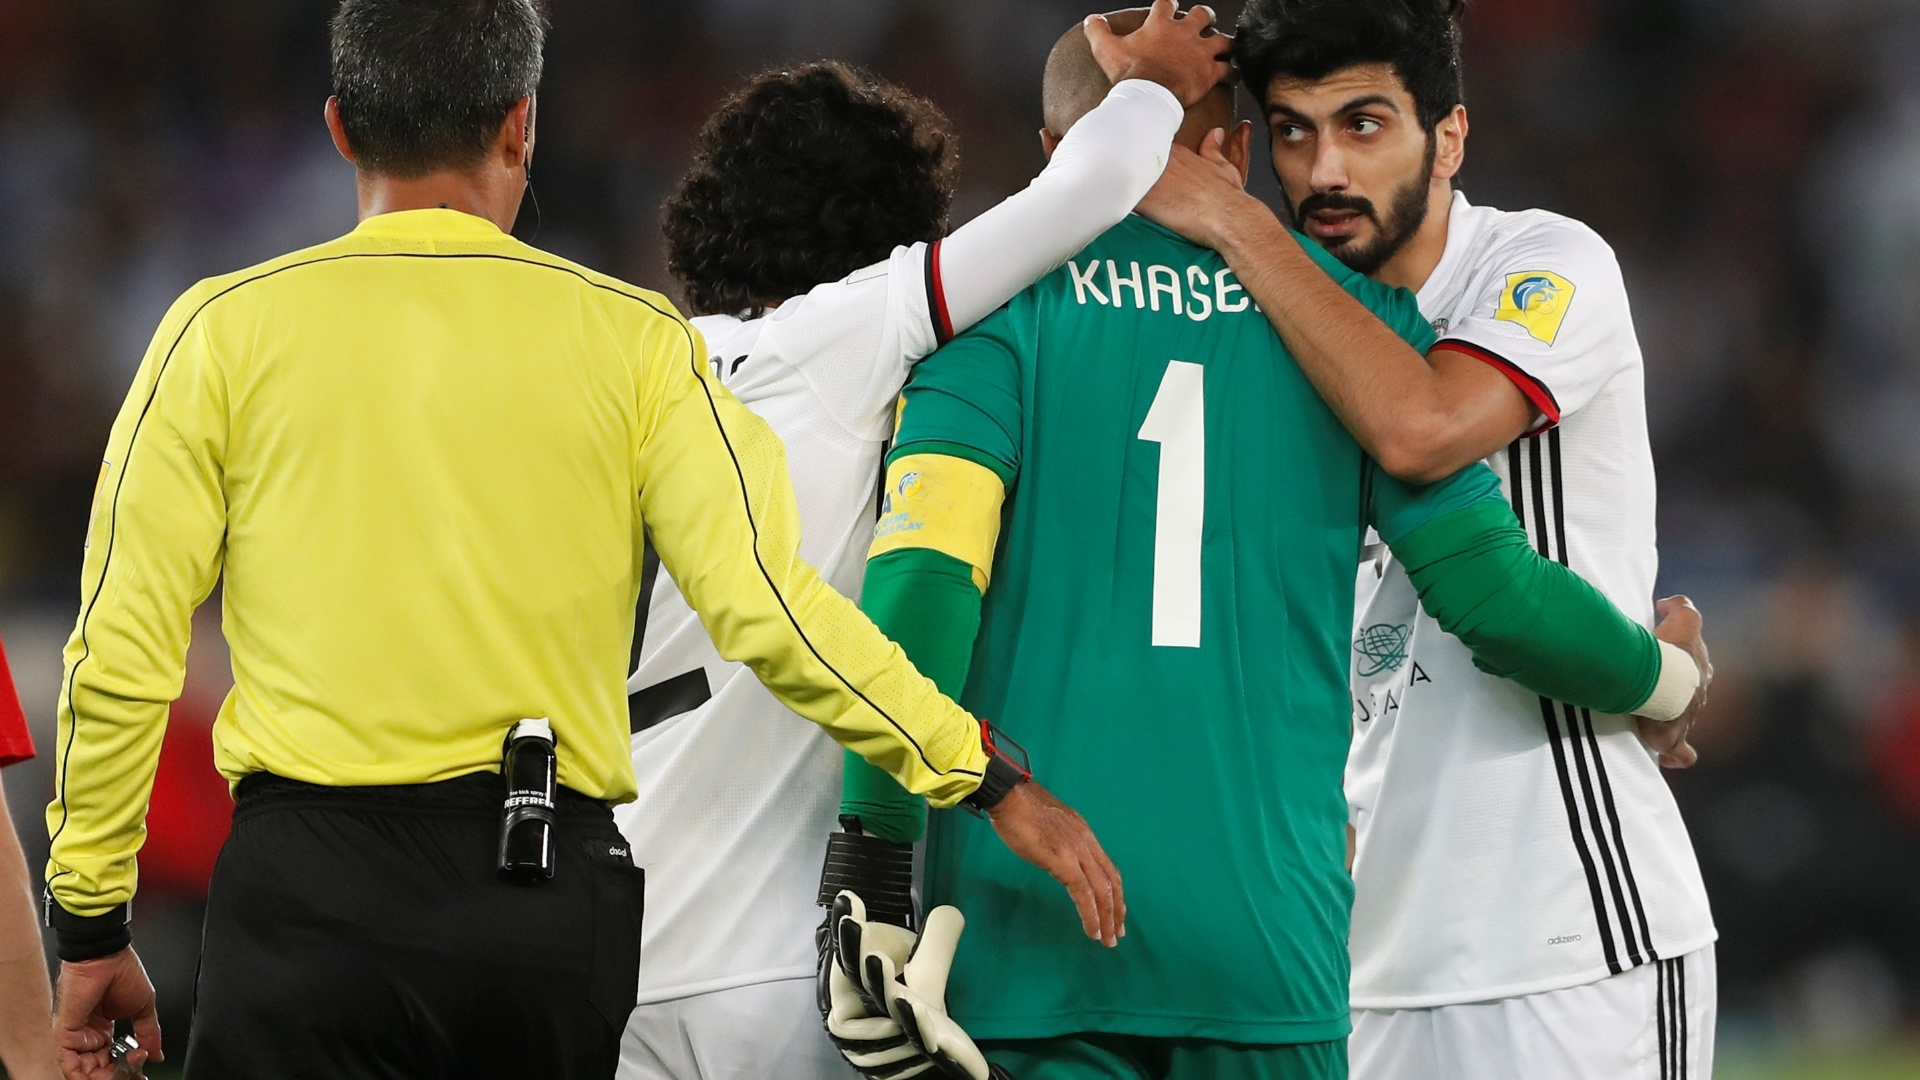 Goleiro Ali Khaseif Housani deixa semifinal lesionado